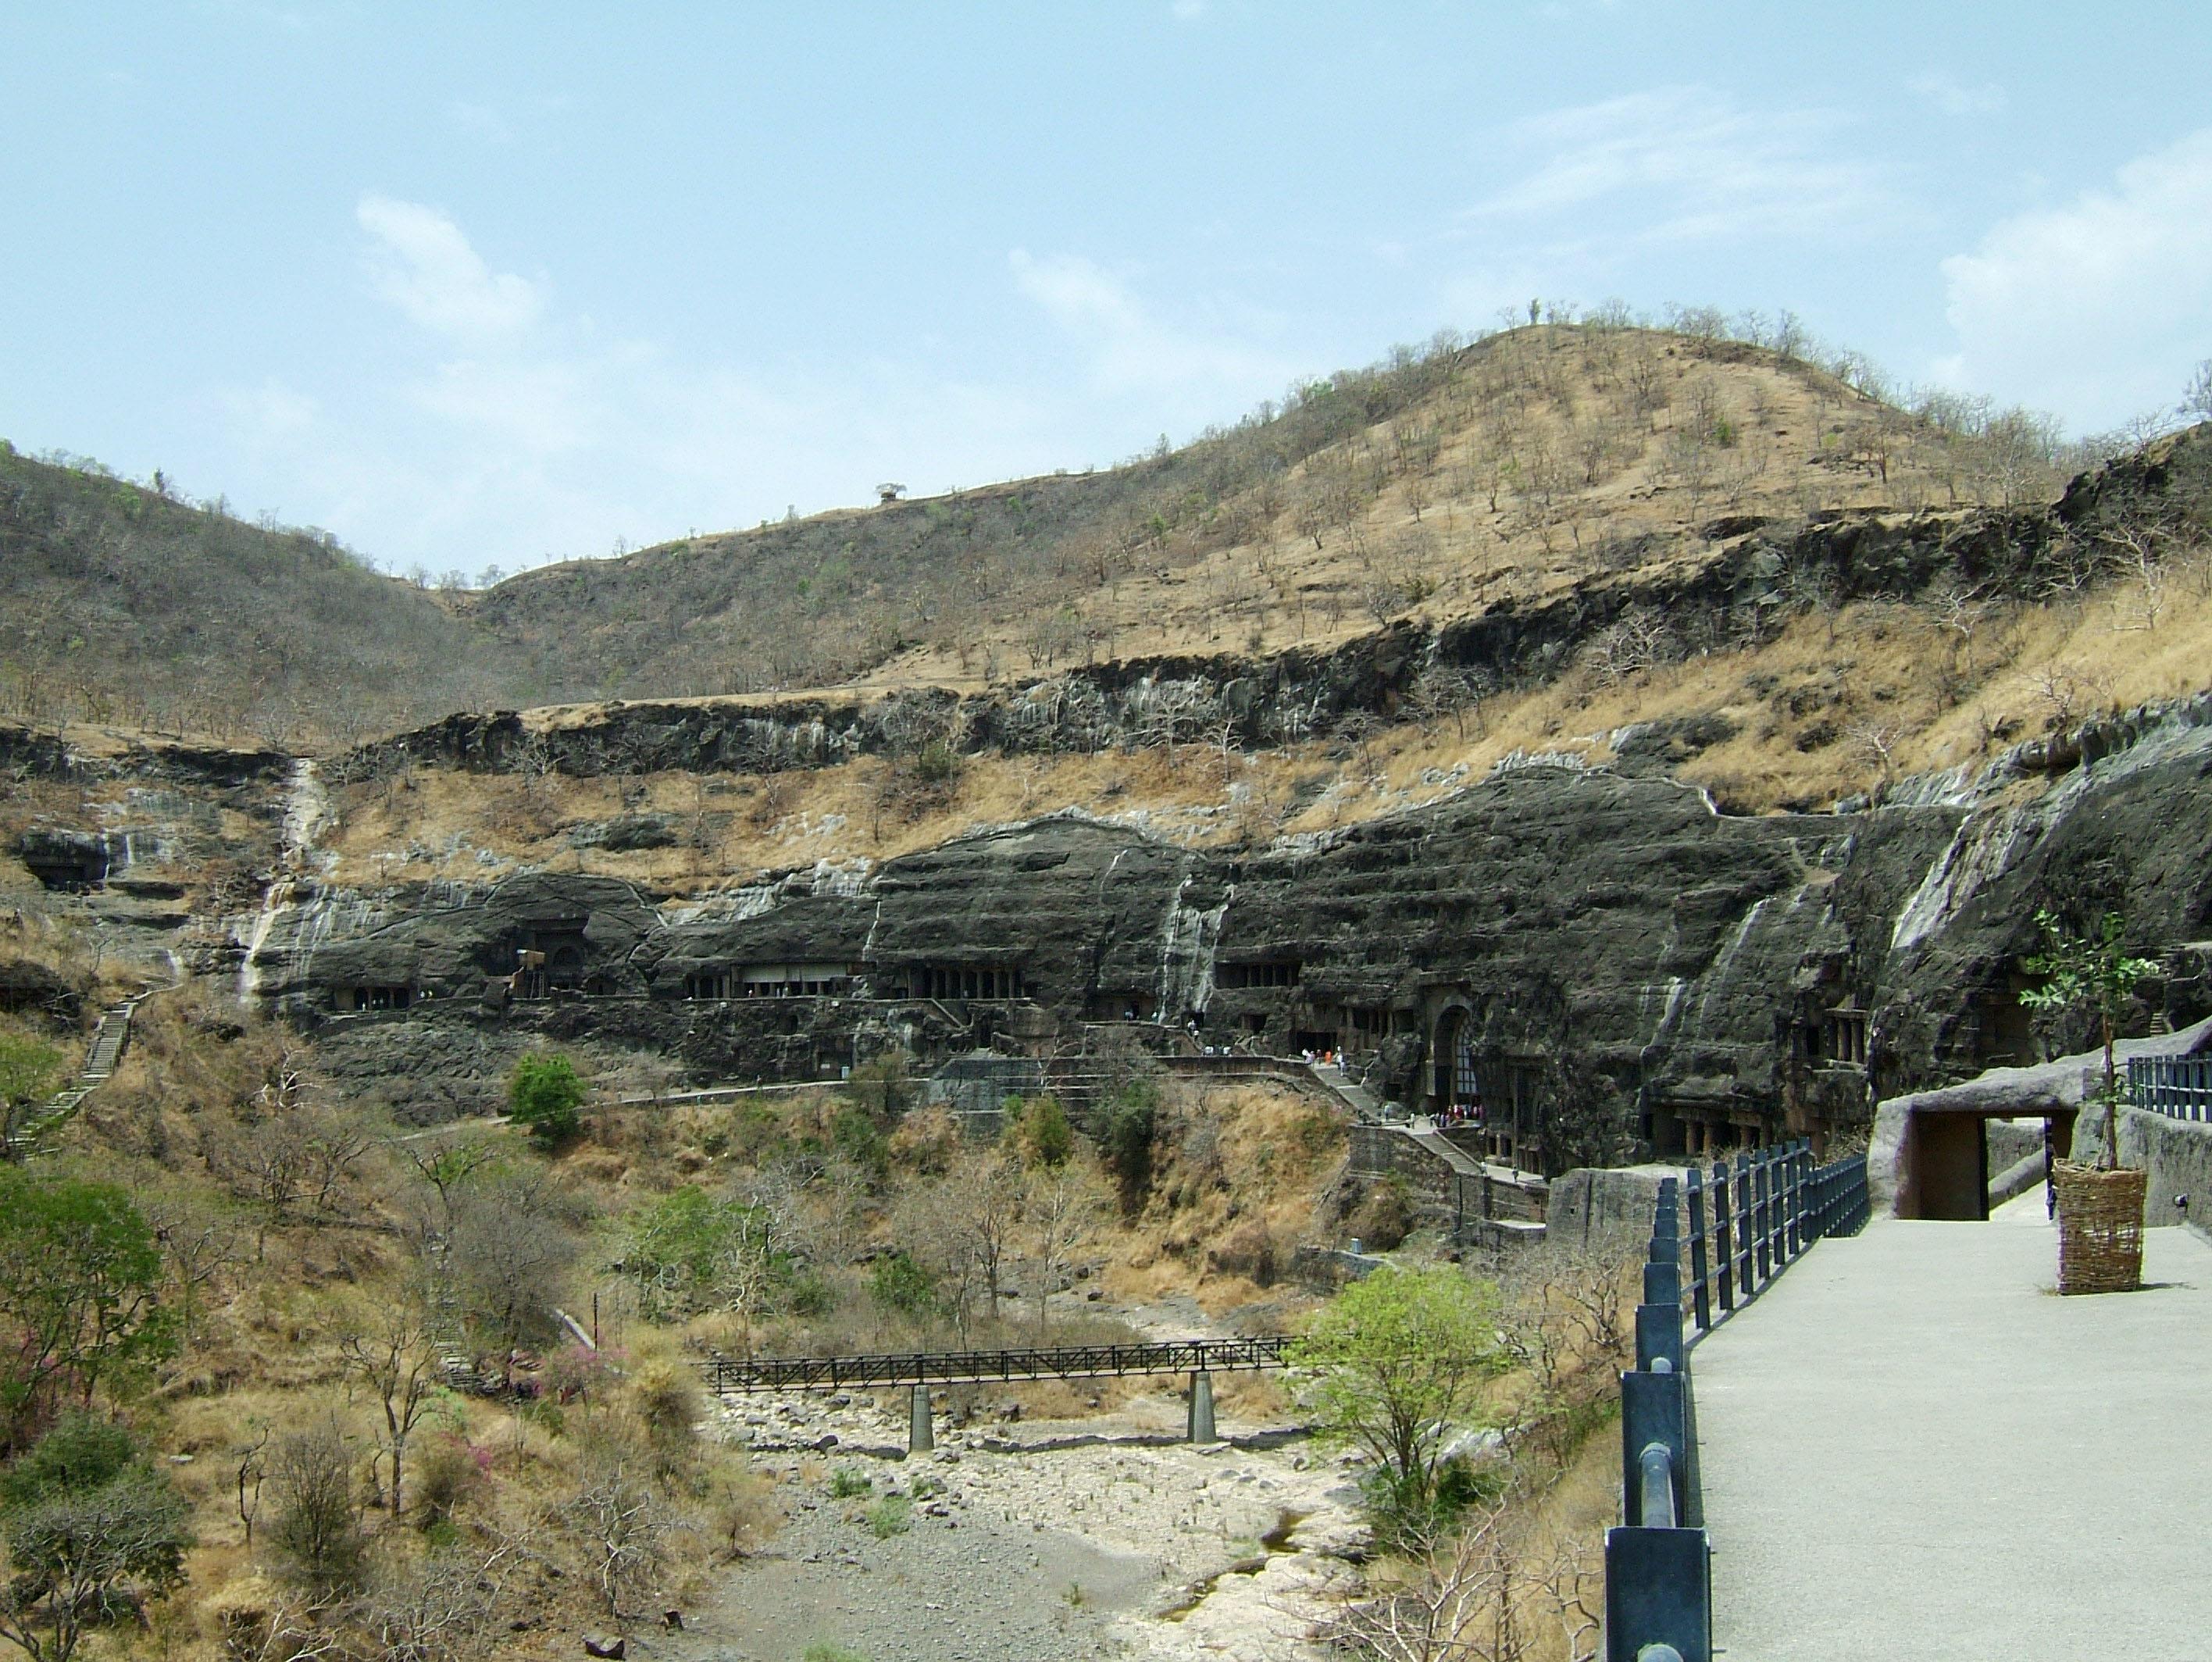 Marathwada Ajanta Caves entrance India Apr 2004 01